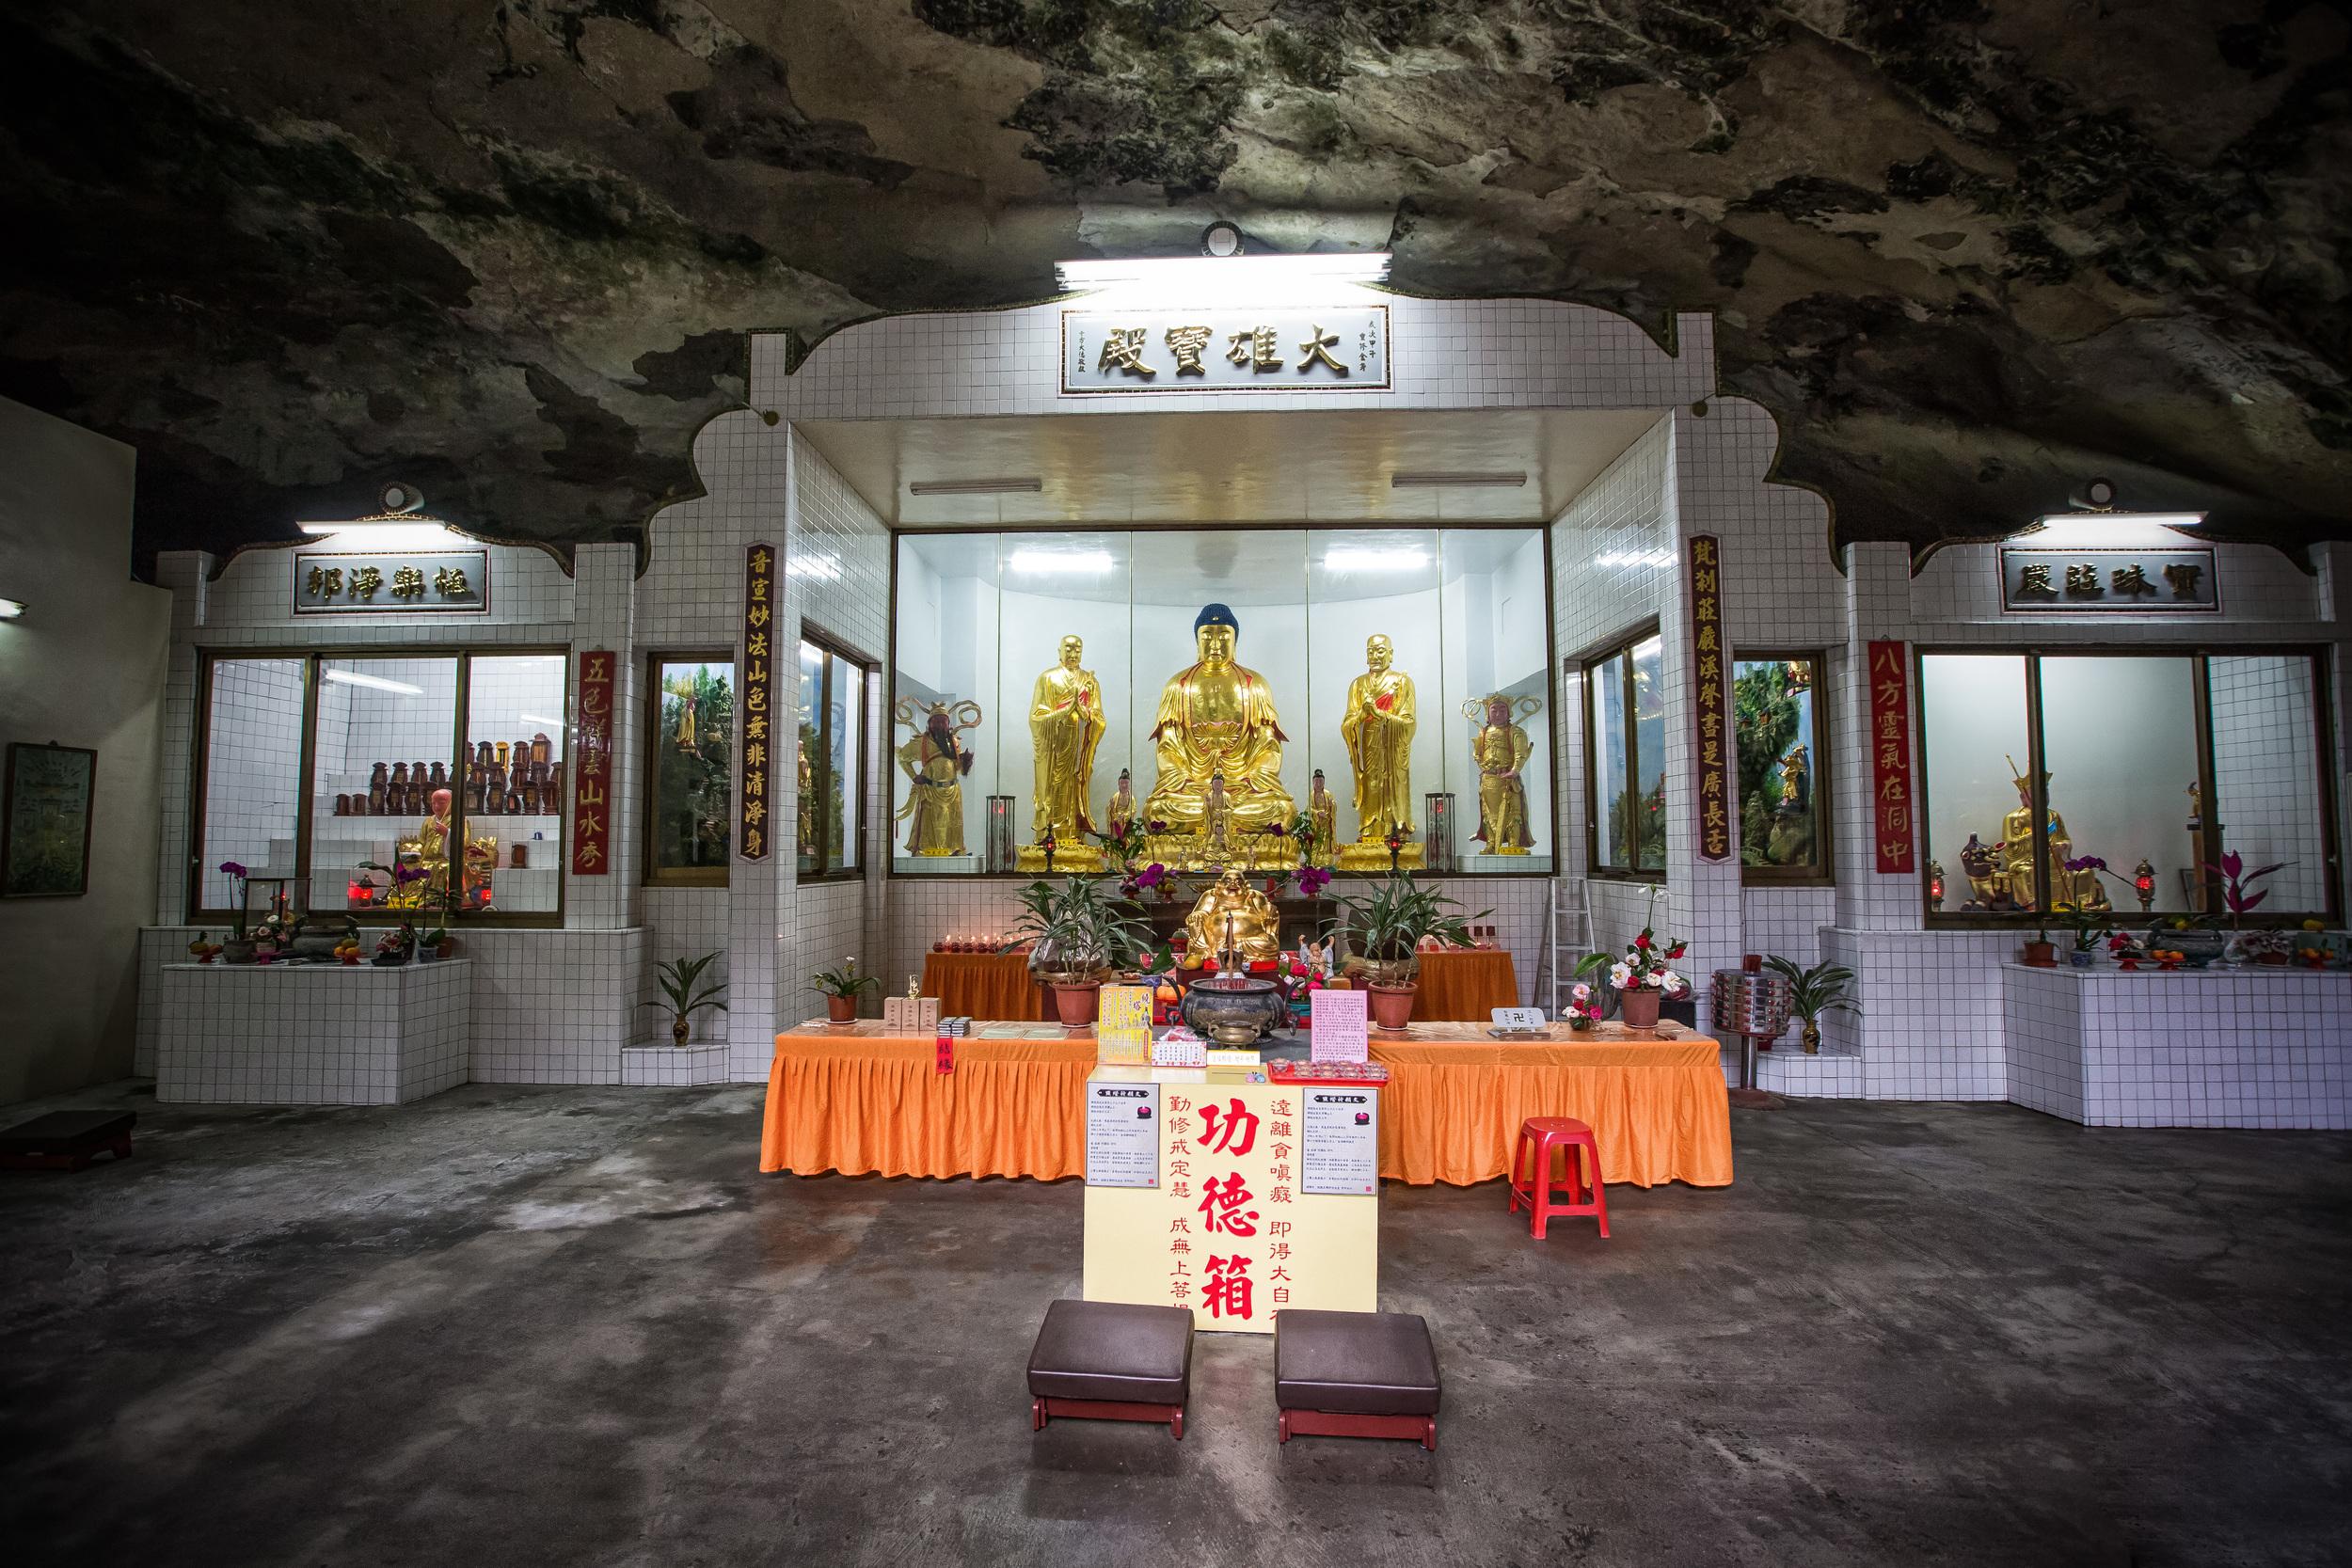 Shui Lian Cave (水簾洞)